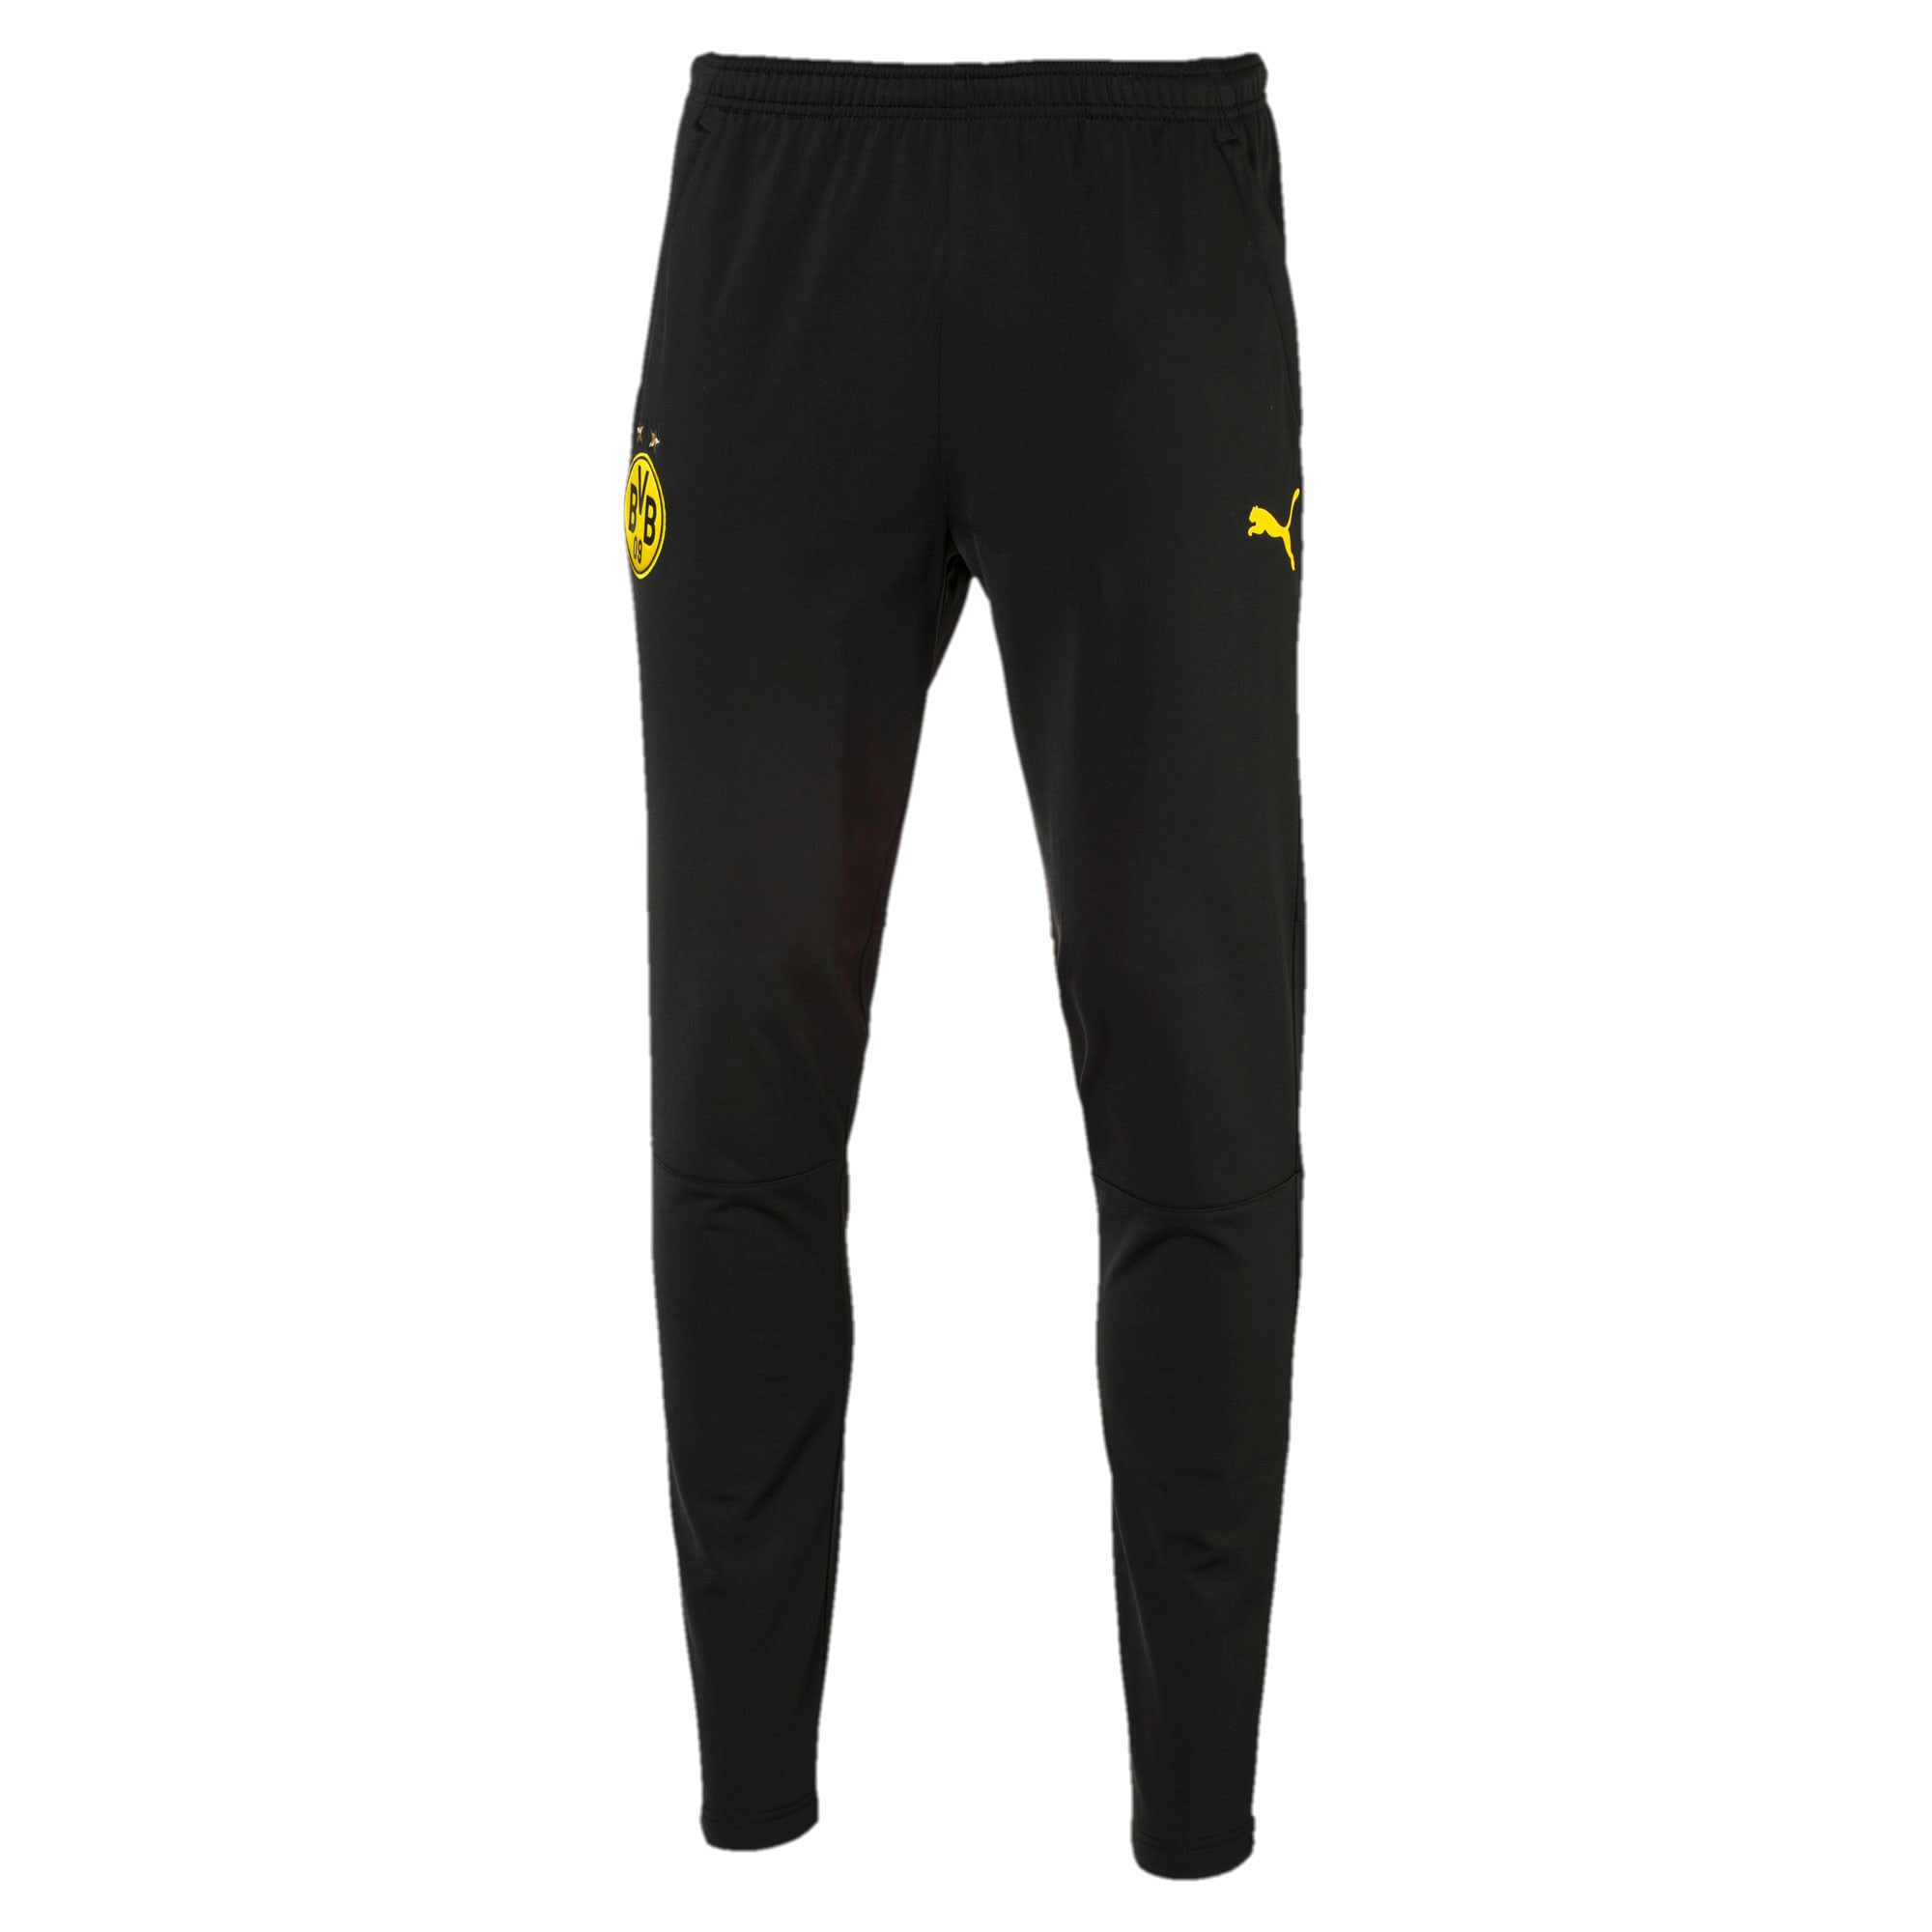 Thumbnail 4 of ドルトムント BVB トレーニング パンツ, Puma Black-Cyber Yellow, medium-JPN